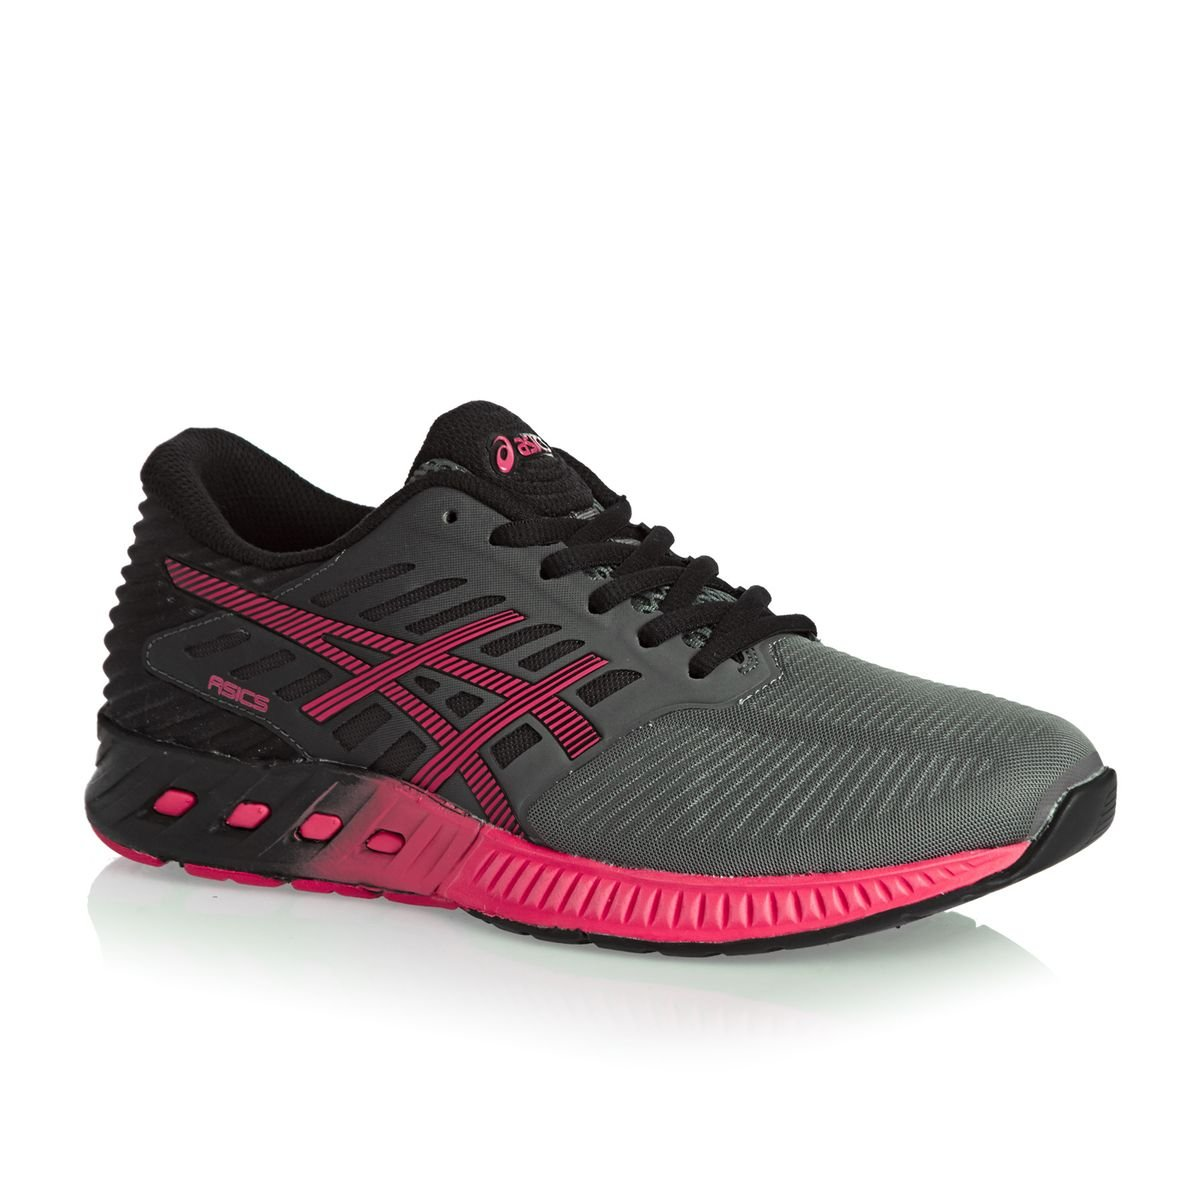 Asics Fuzex T689n, Zapatillas de Running para Mujer 39 EU|Titanium/Azalea/Black